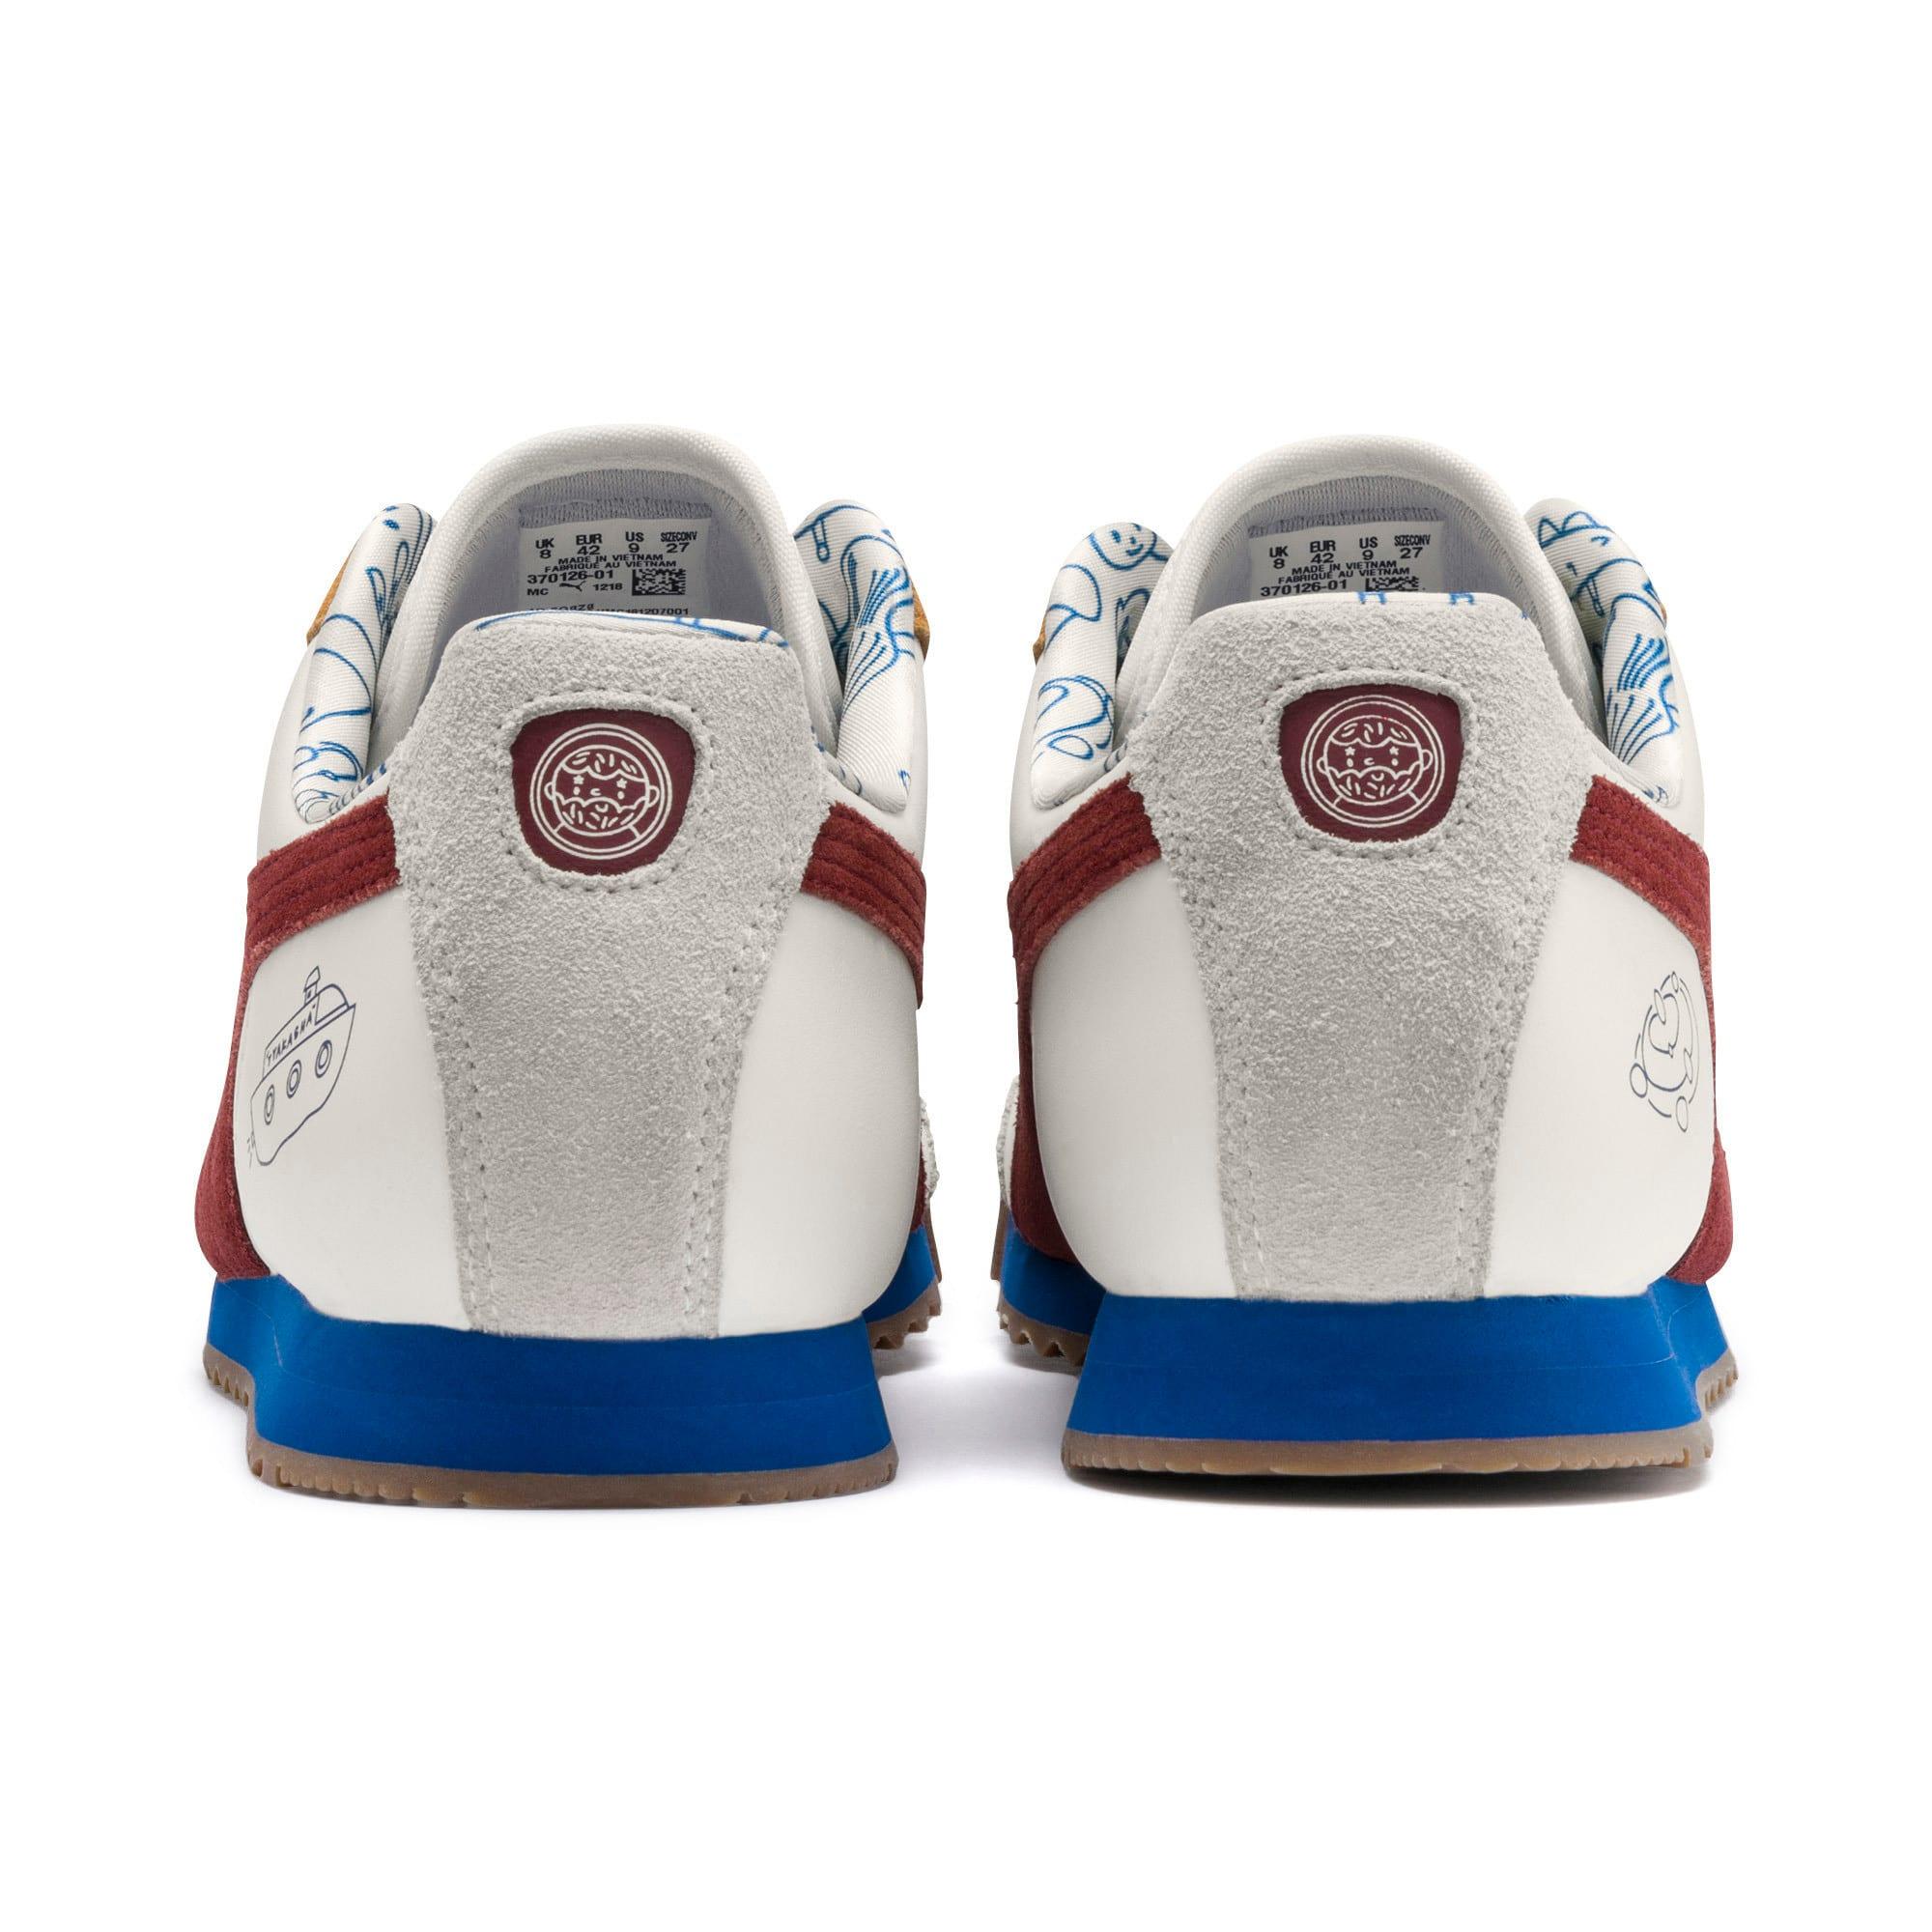 Thumbnail 5 of PUMA x TYAKASHA Roma Sneakers, Marshmallow-Fired Brick, medium